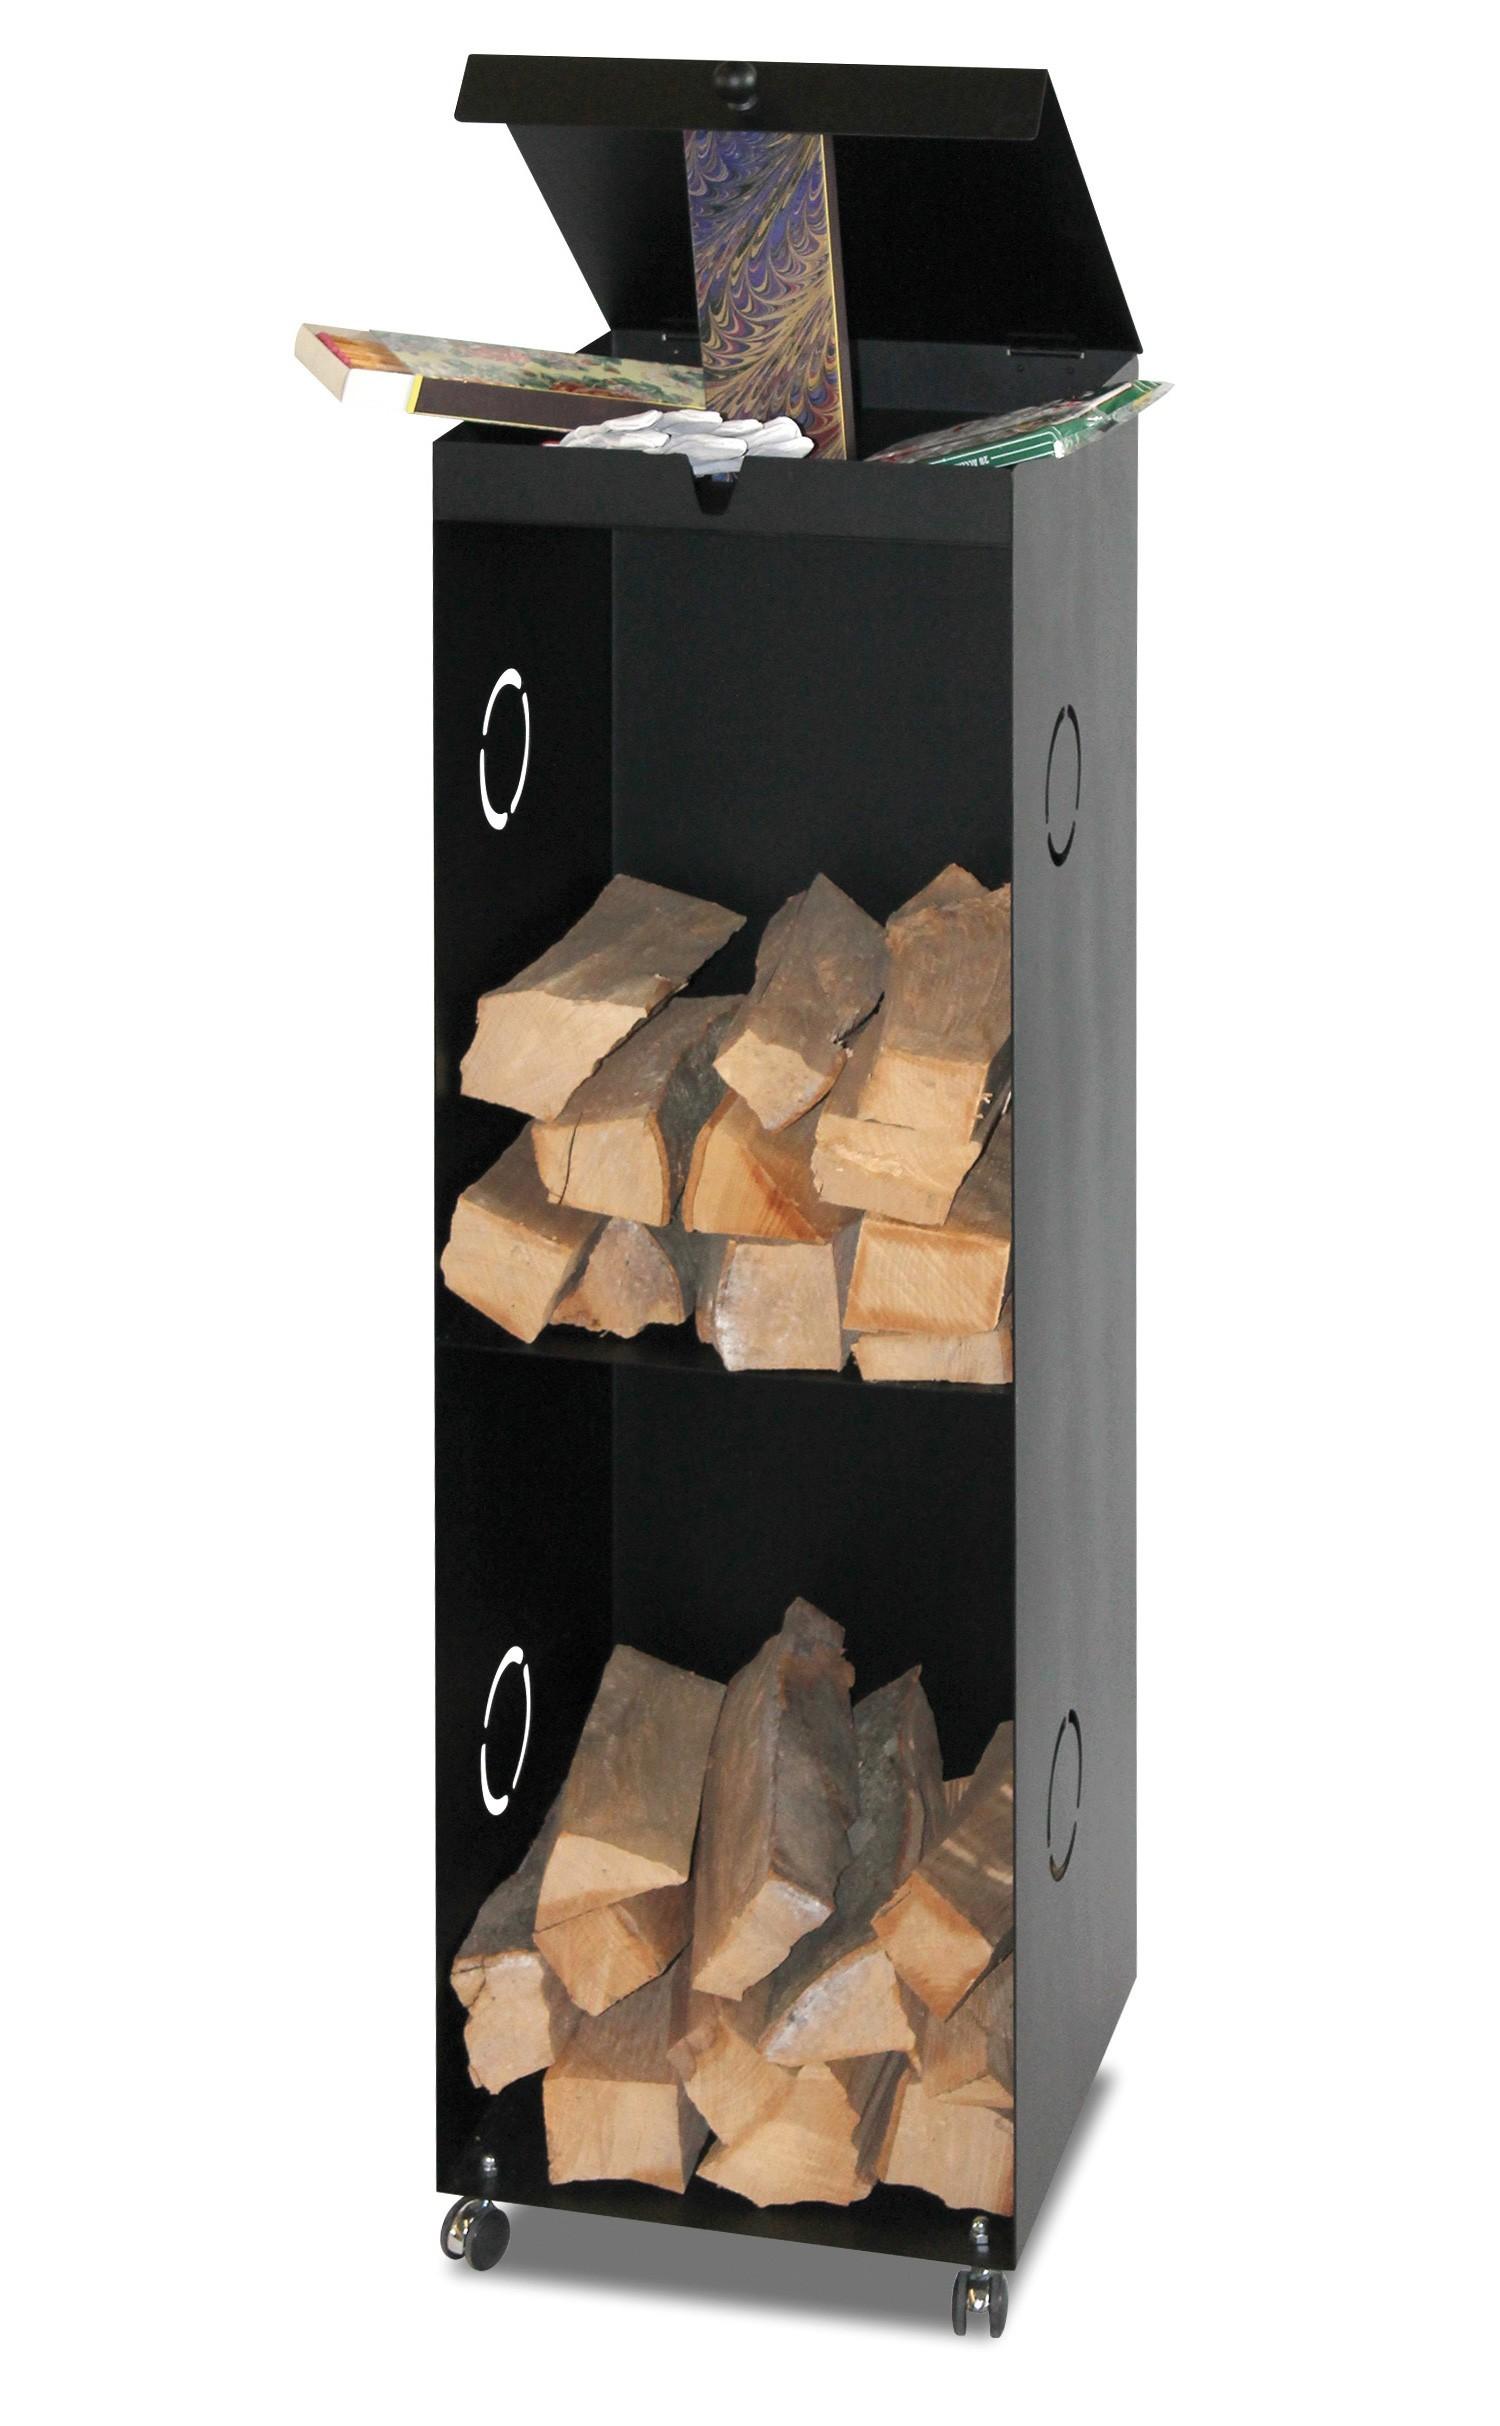 B-Ware Kaminholzregal Lienbacher fahrb. schwarz 39x39x126cm Bild 1